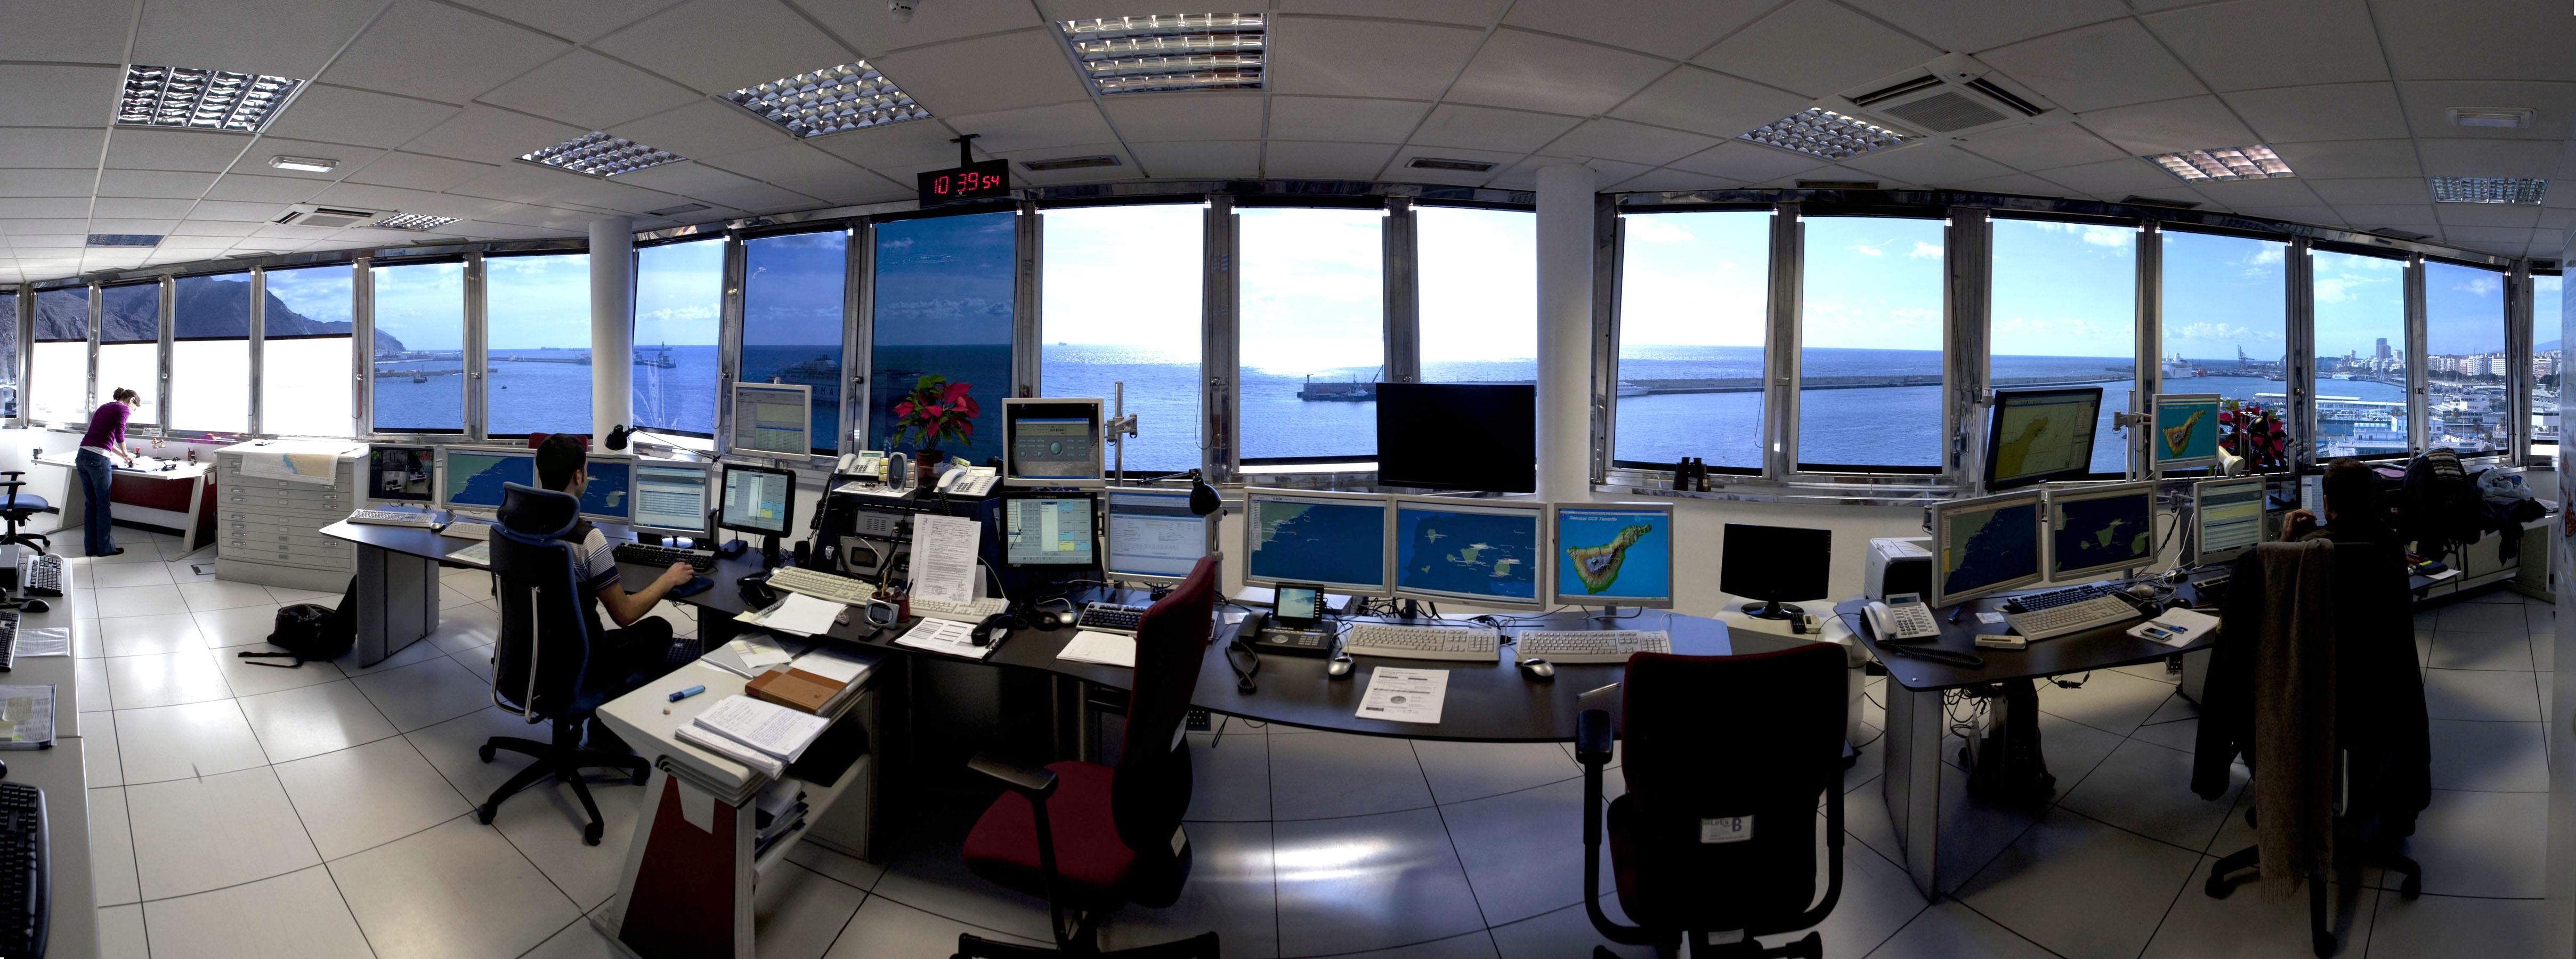 CSS Tenerife (Vista desde interior)